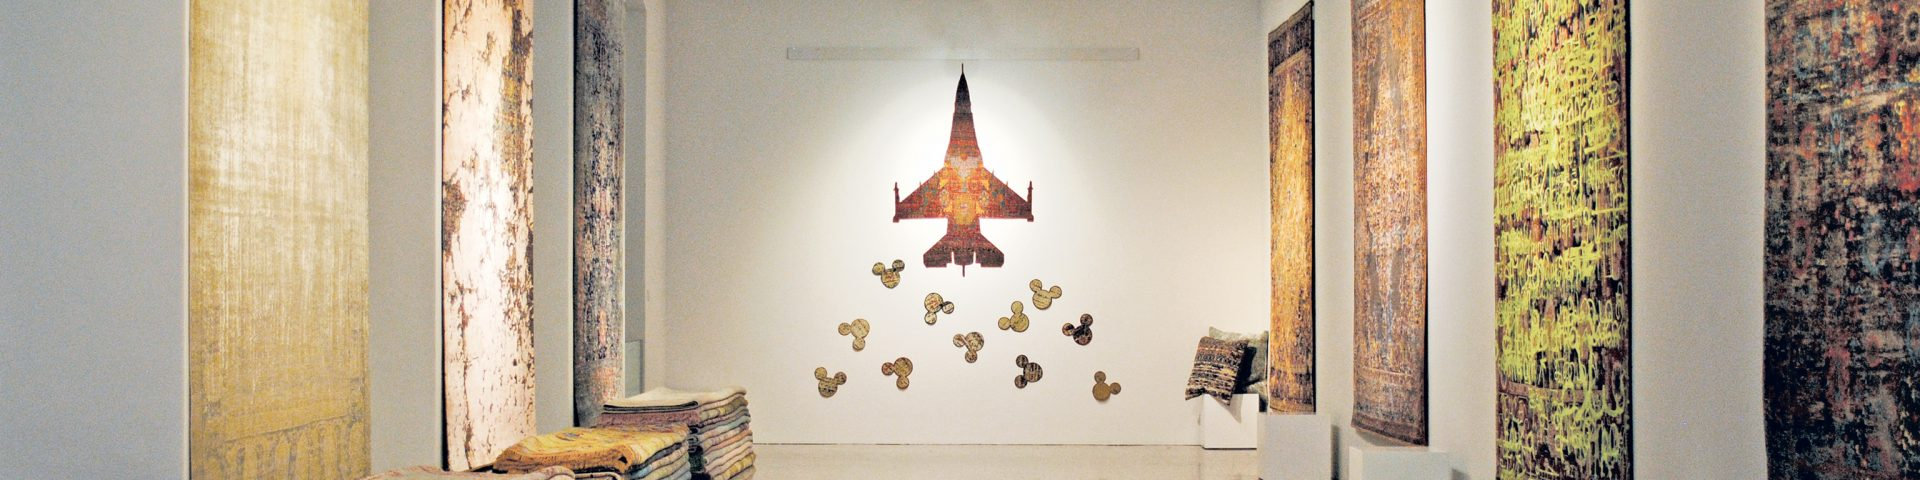 Make Rugs Not War - Carpets as Art, A Review - Jan Kath - The Ruggist